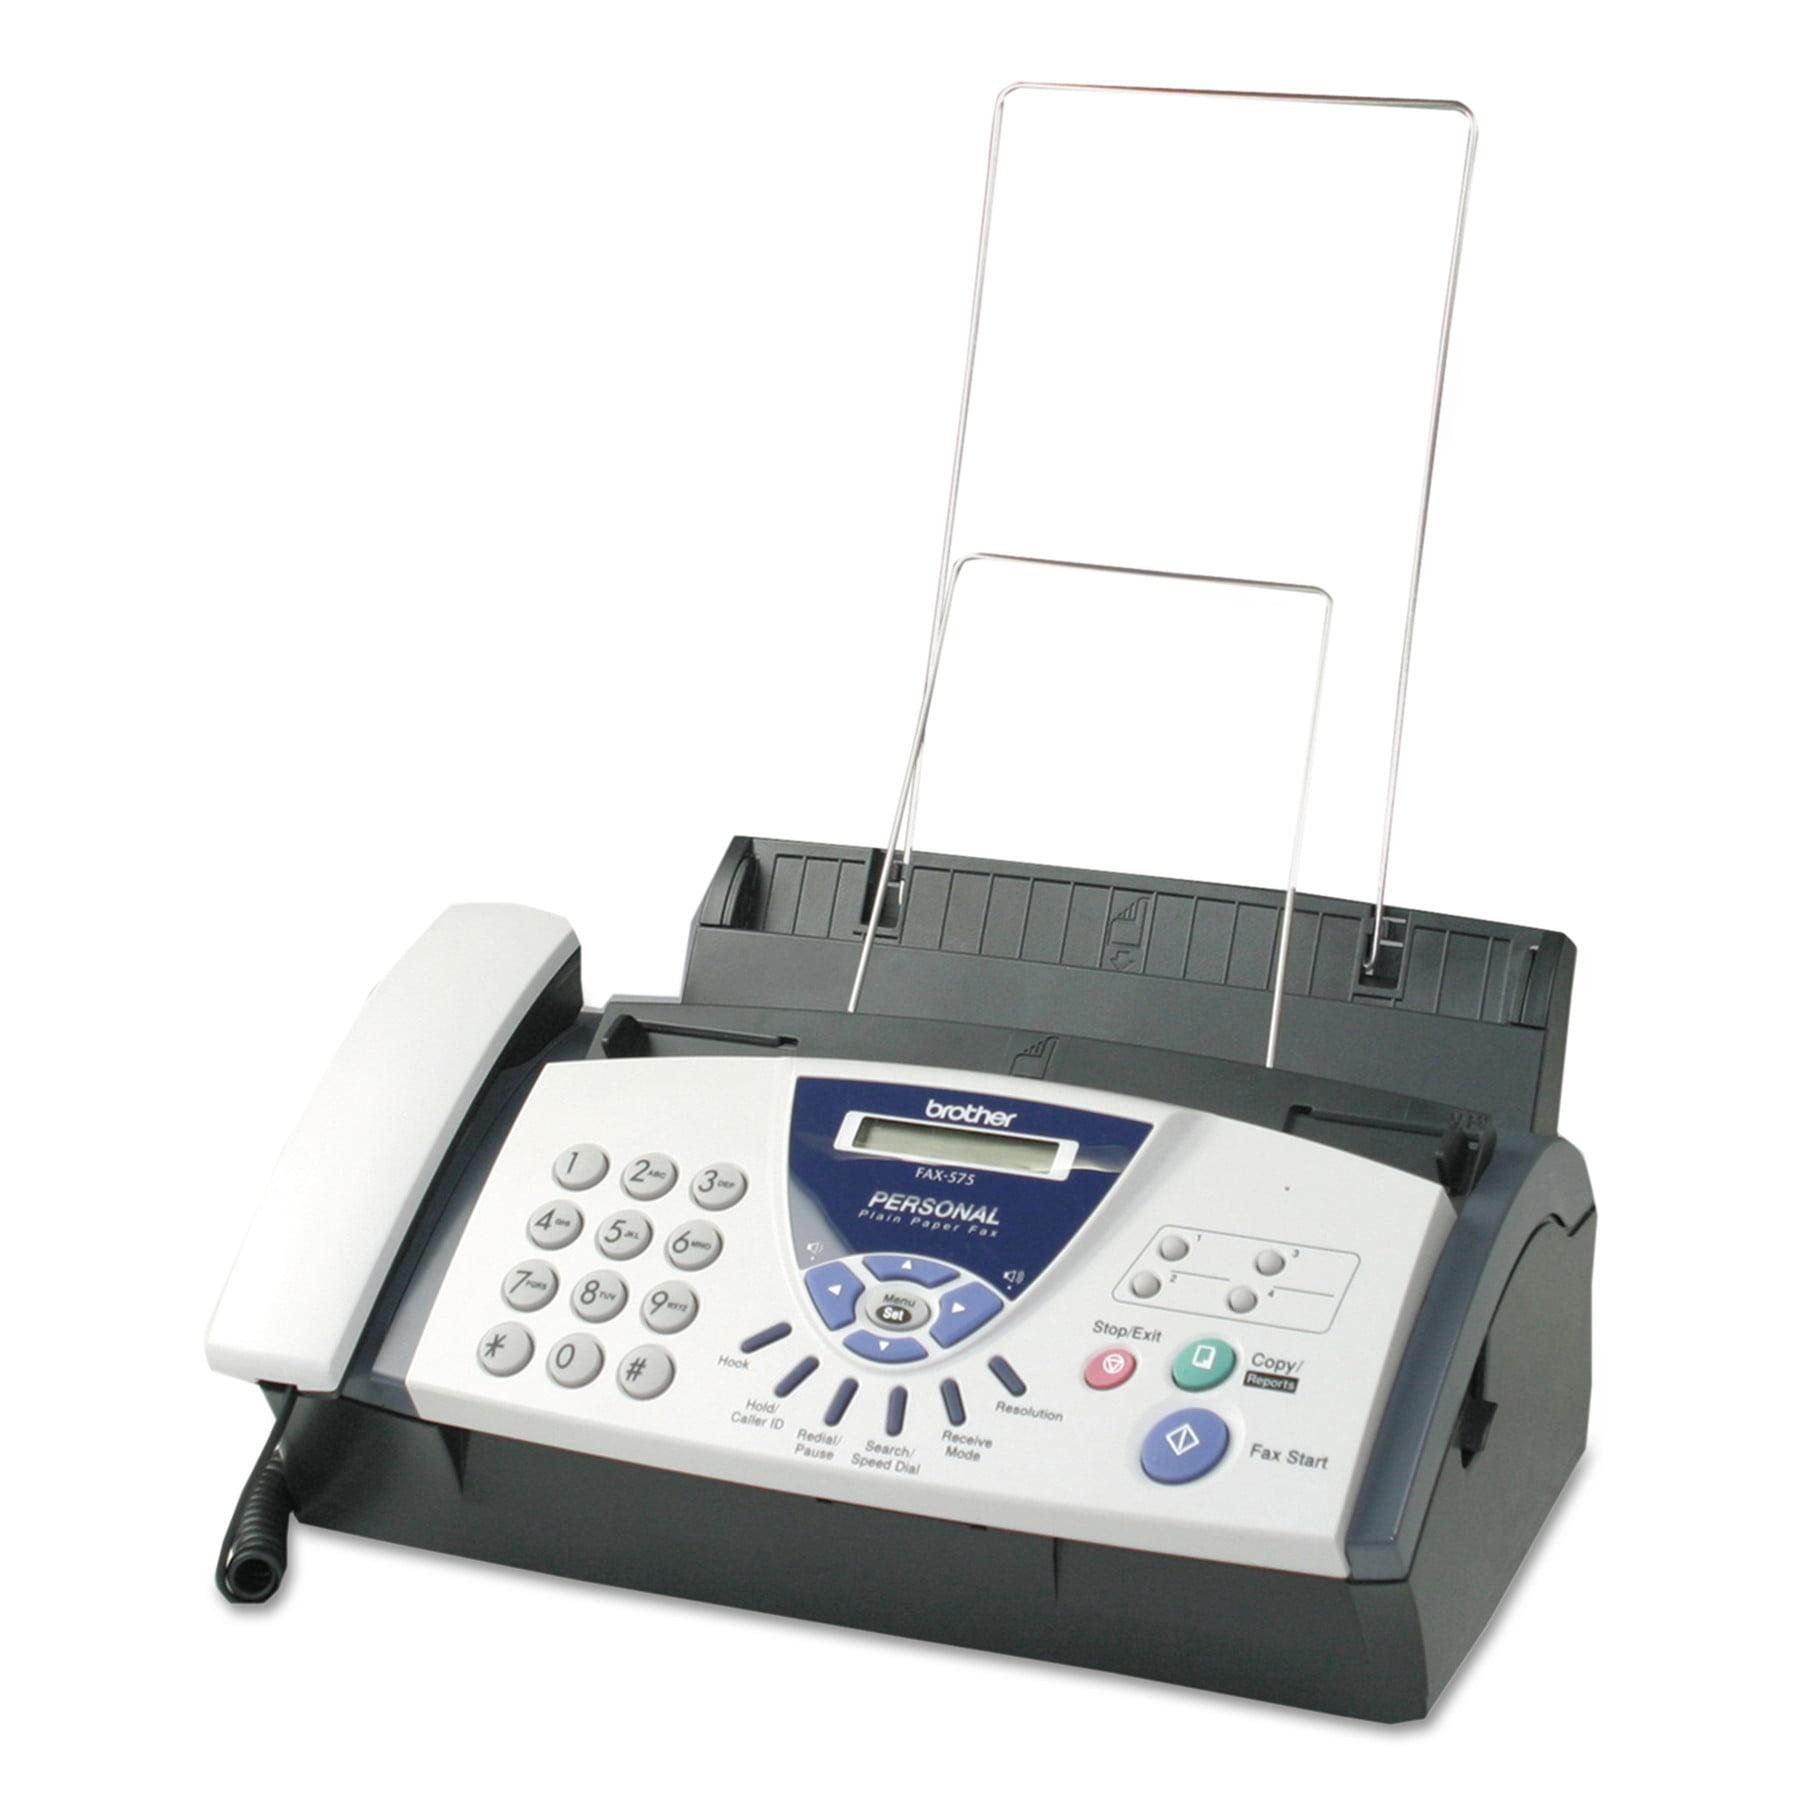 Brother FAX575 Plain Paper Fax / Copier Machine - Walmart.com